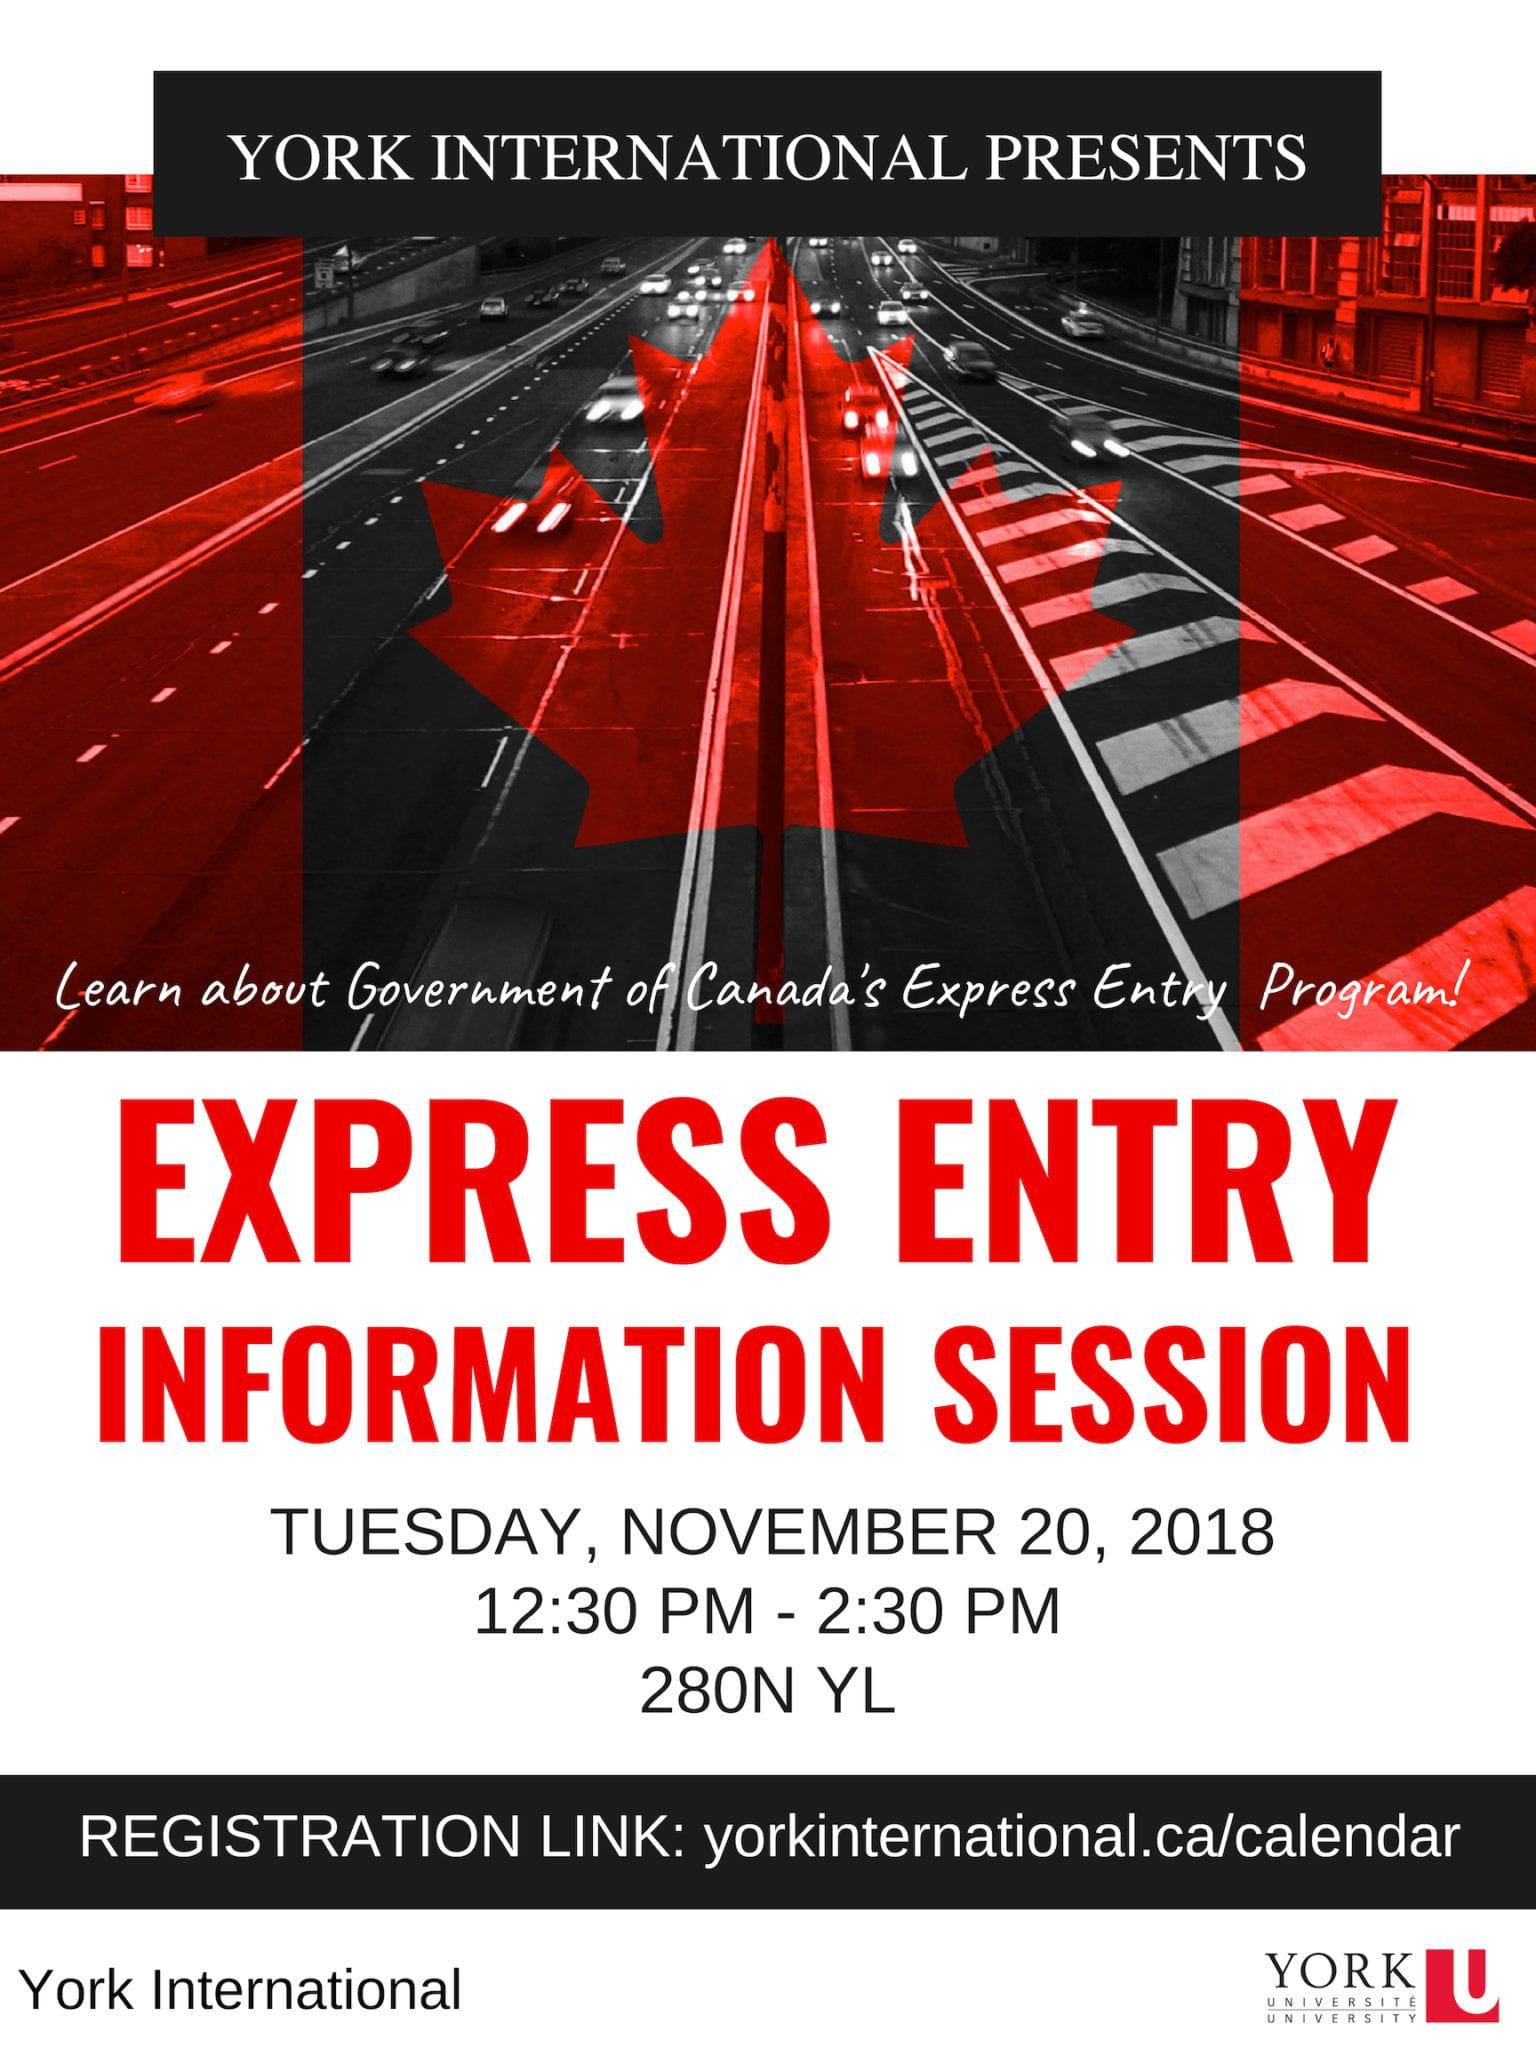 Express Entry Information Session @ 280N York Lanes